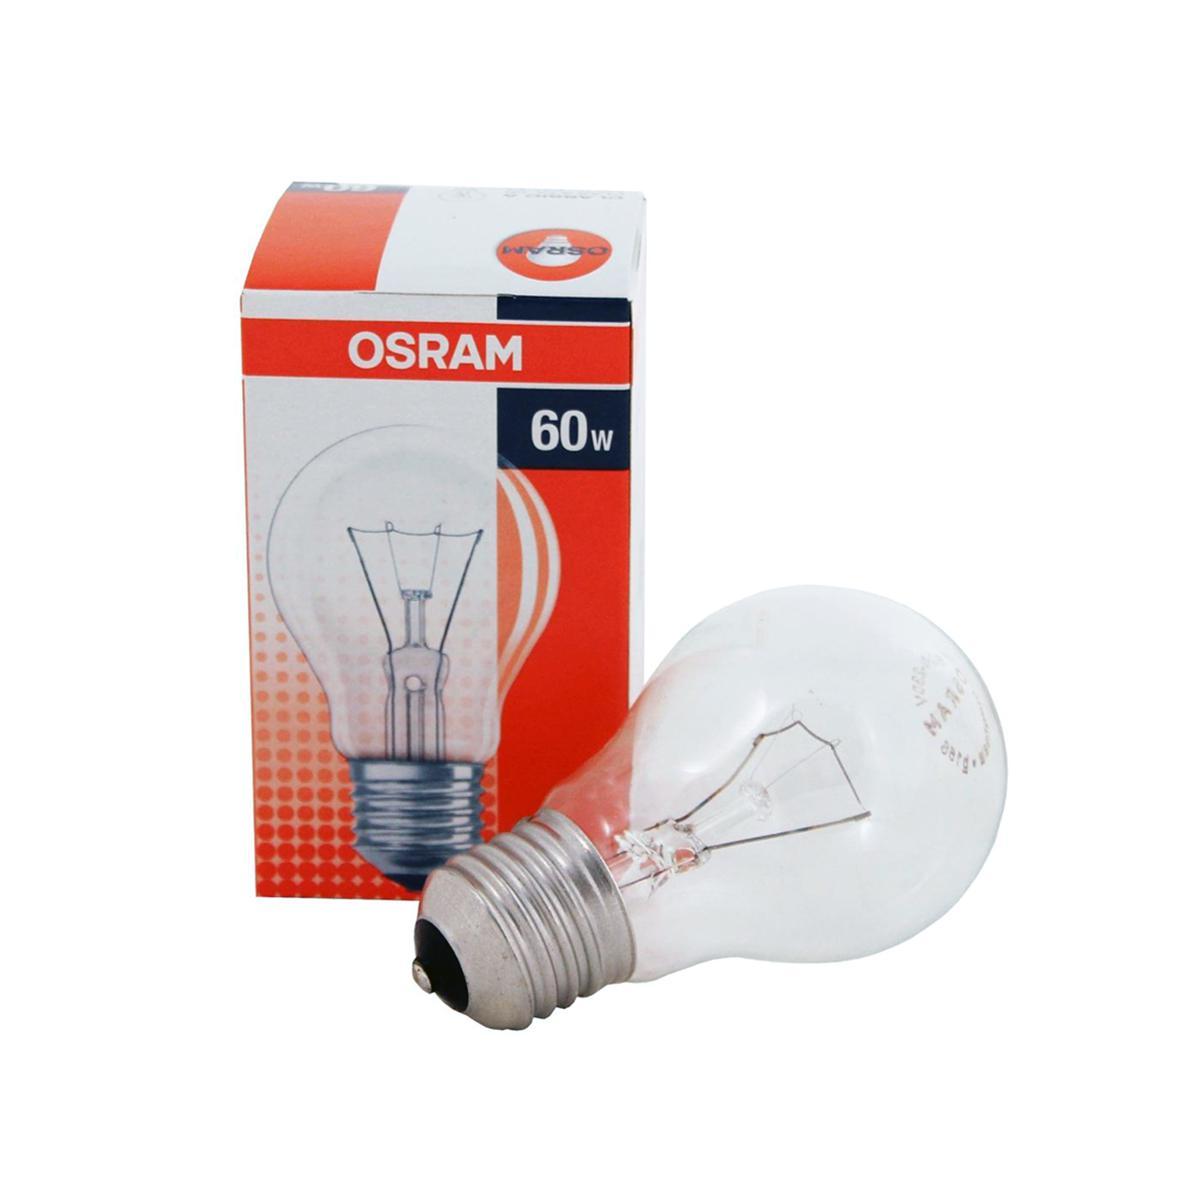 Лампа накаливания Osram Classic a cl 60w e27 лампы osram